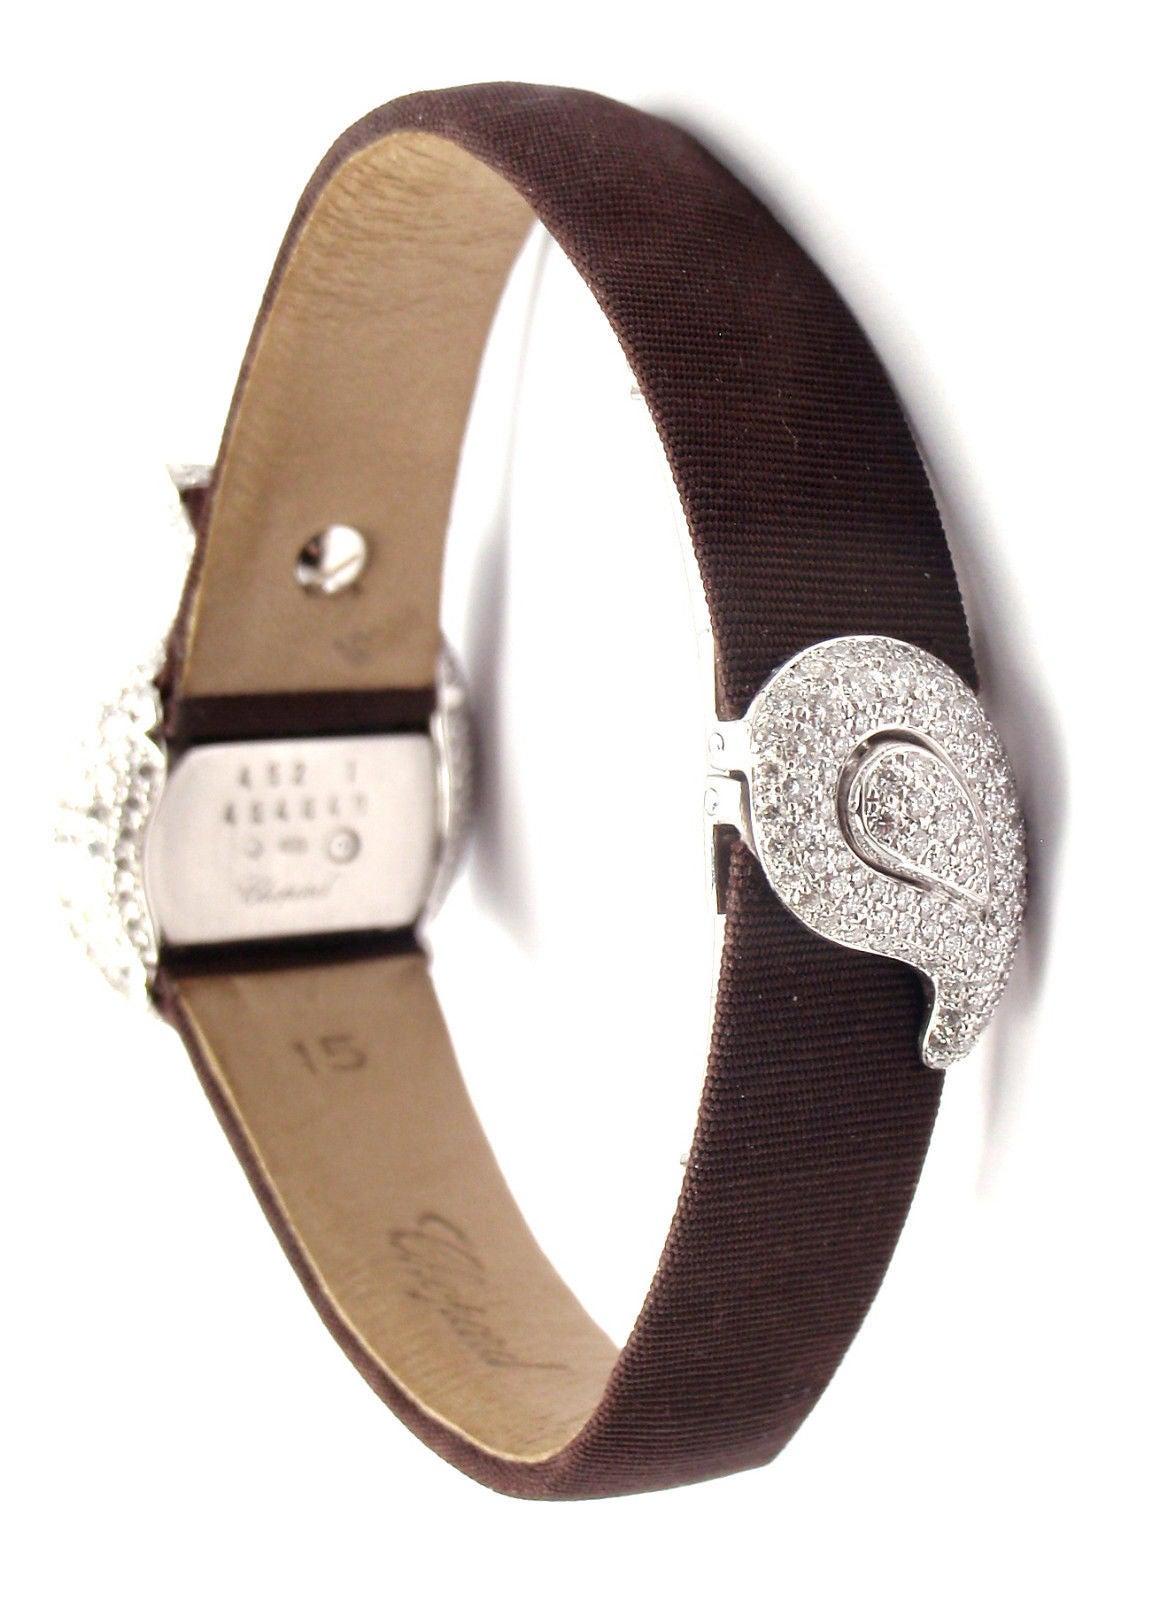 Chopard Lady's White Gold Diamond Pave Casmir Watch 5